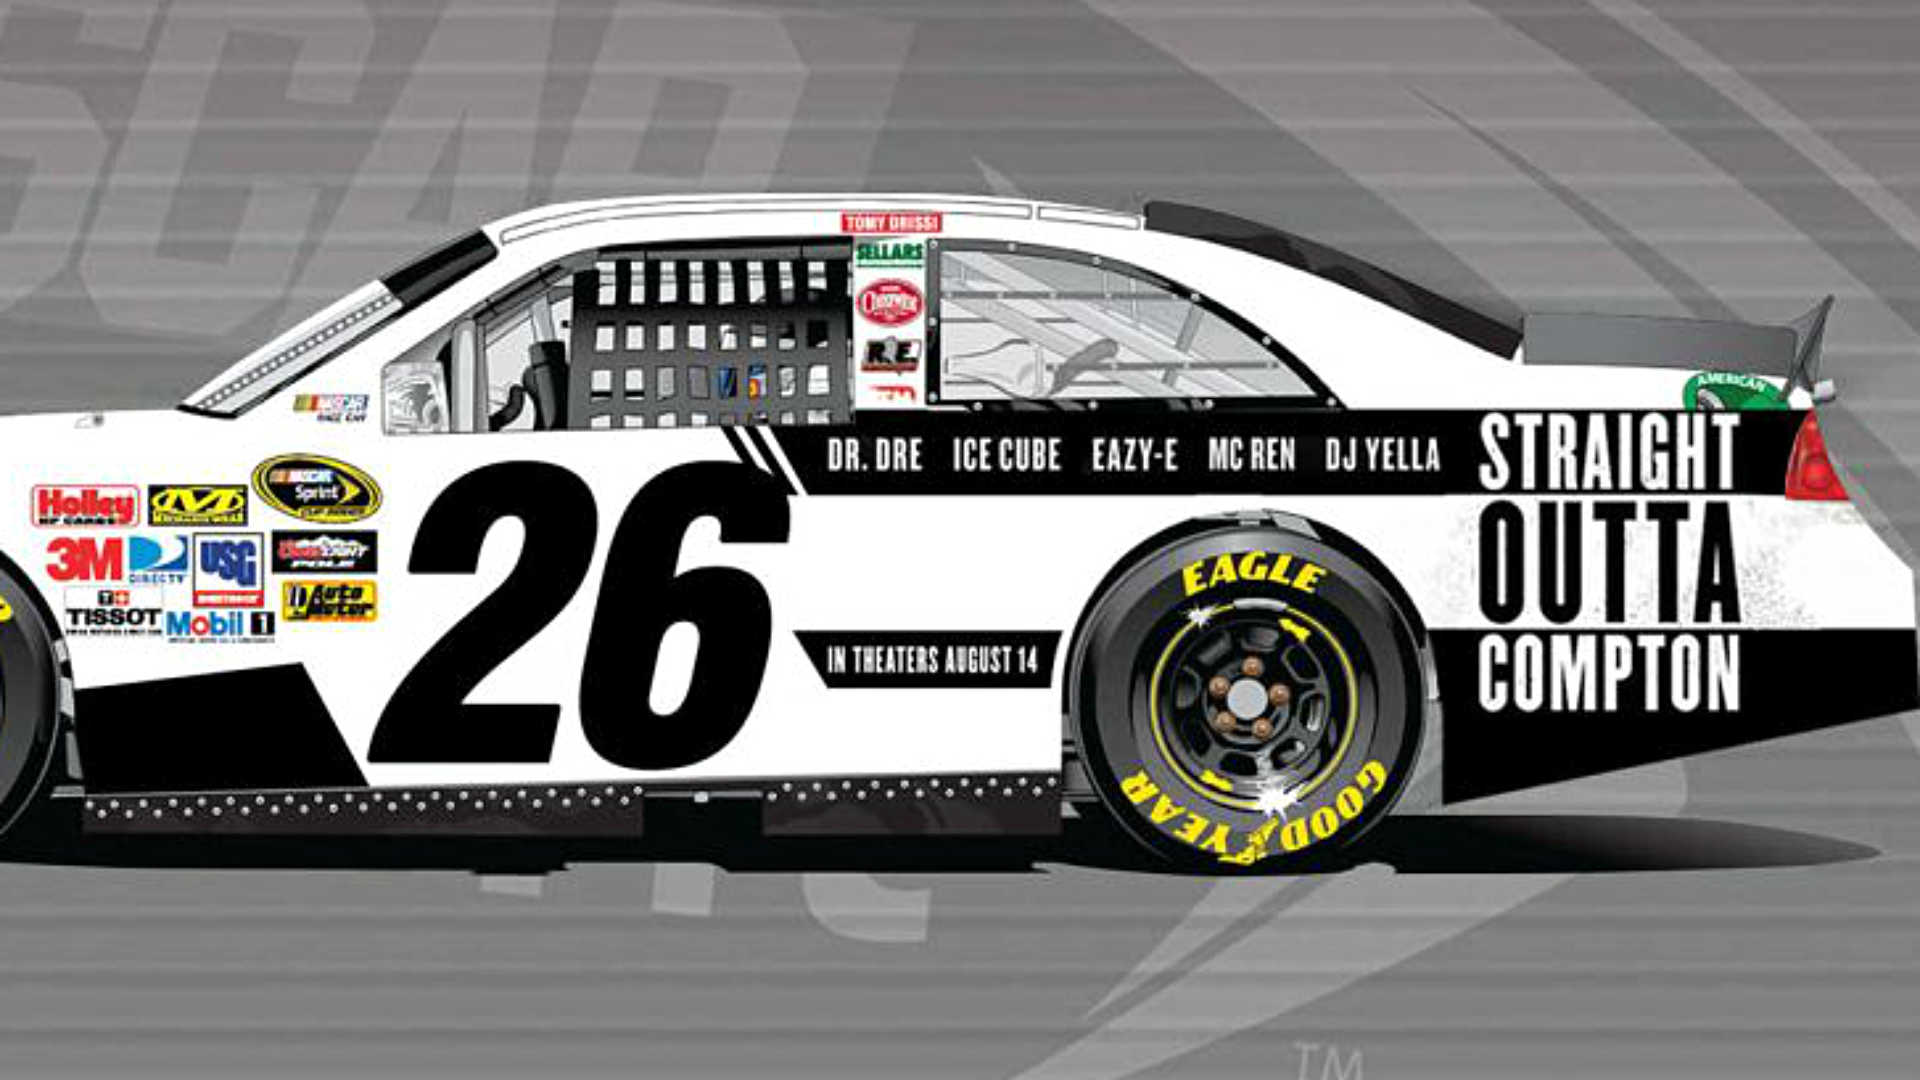 NASCAR-NWA-080615-USNews-FTR